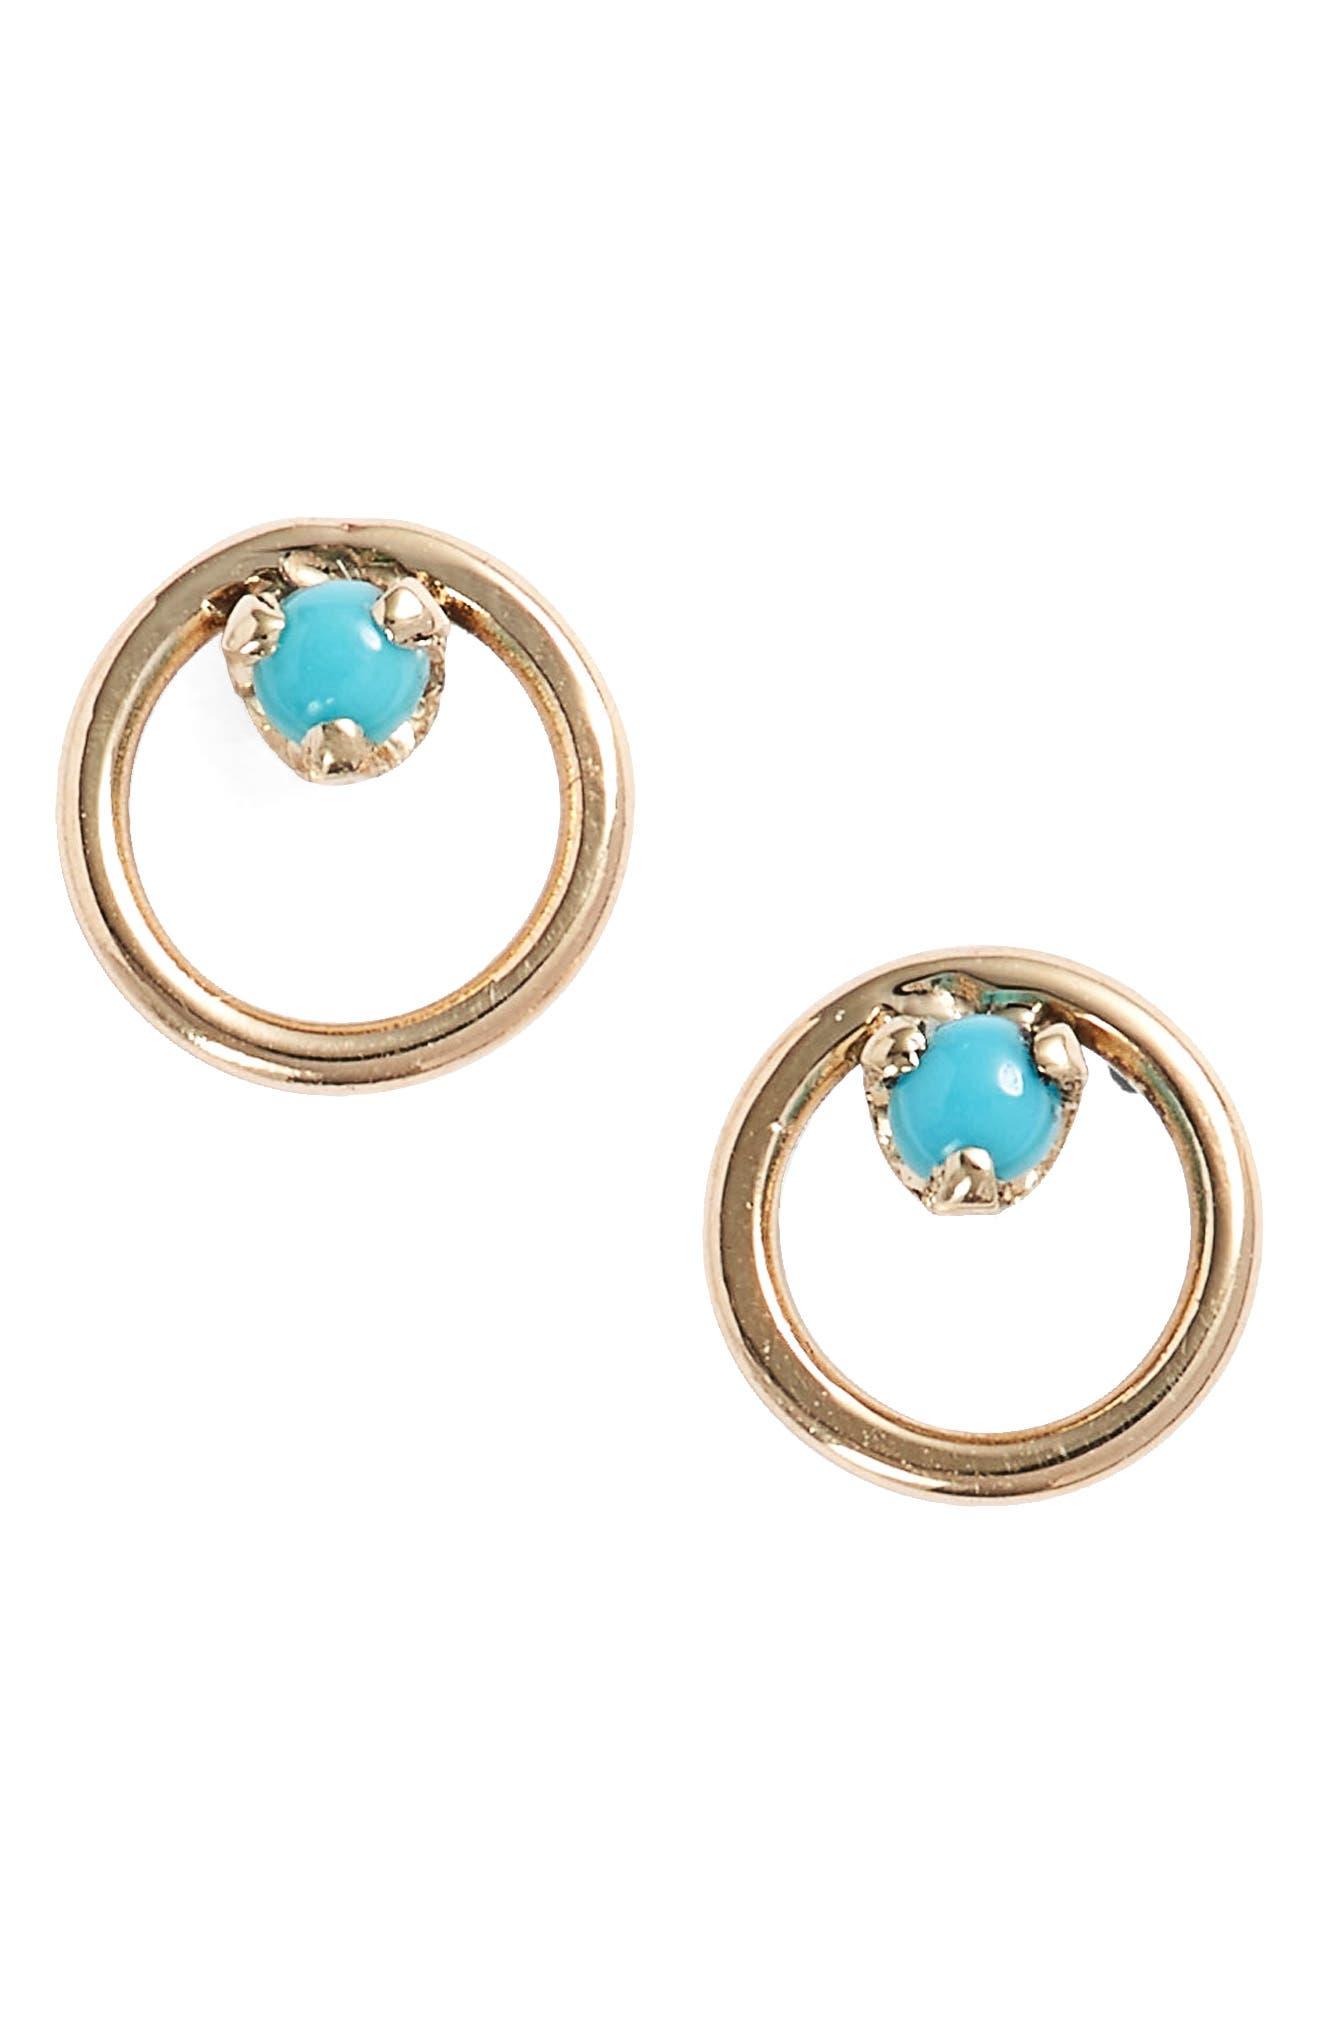 Zoe Chicco Turquoise Circle Stud Earrings